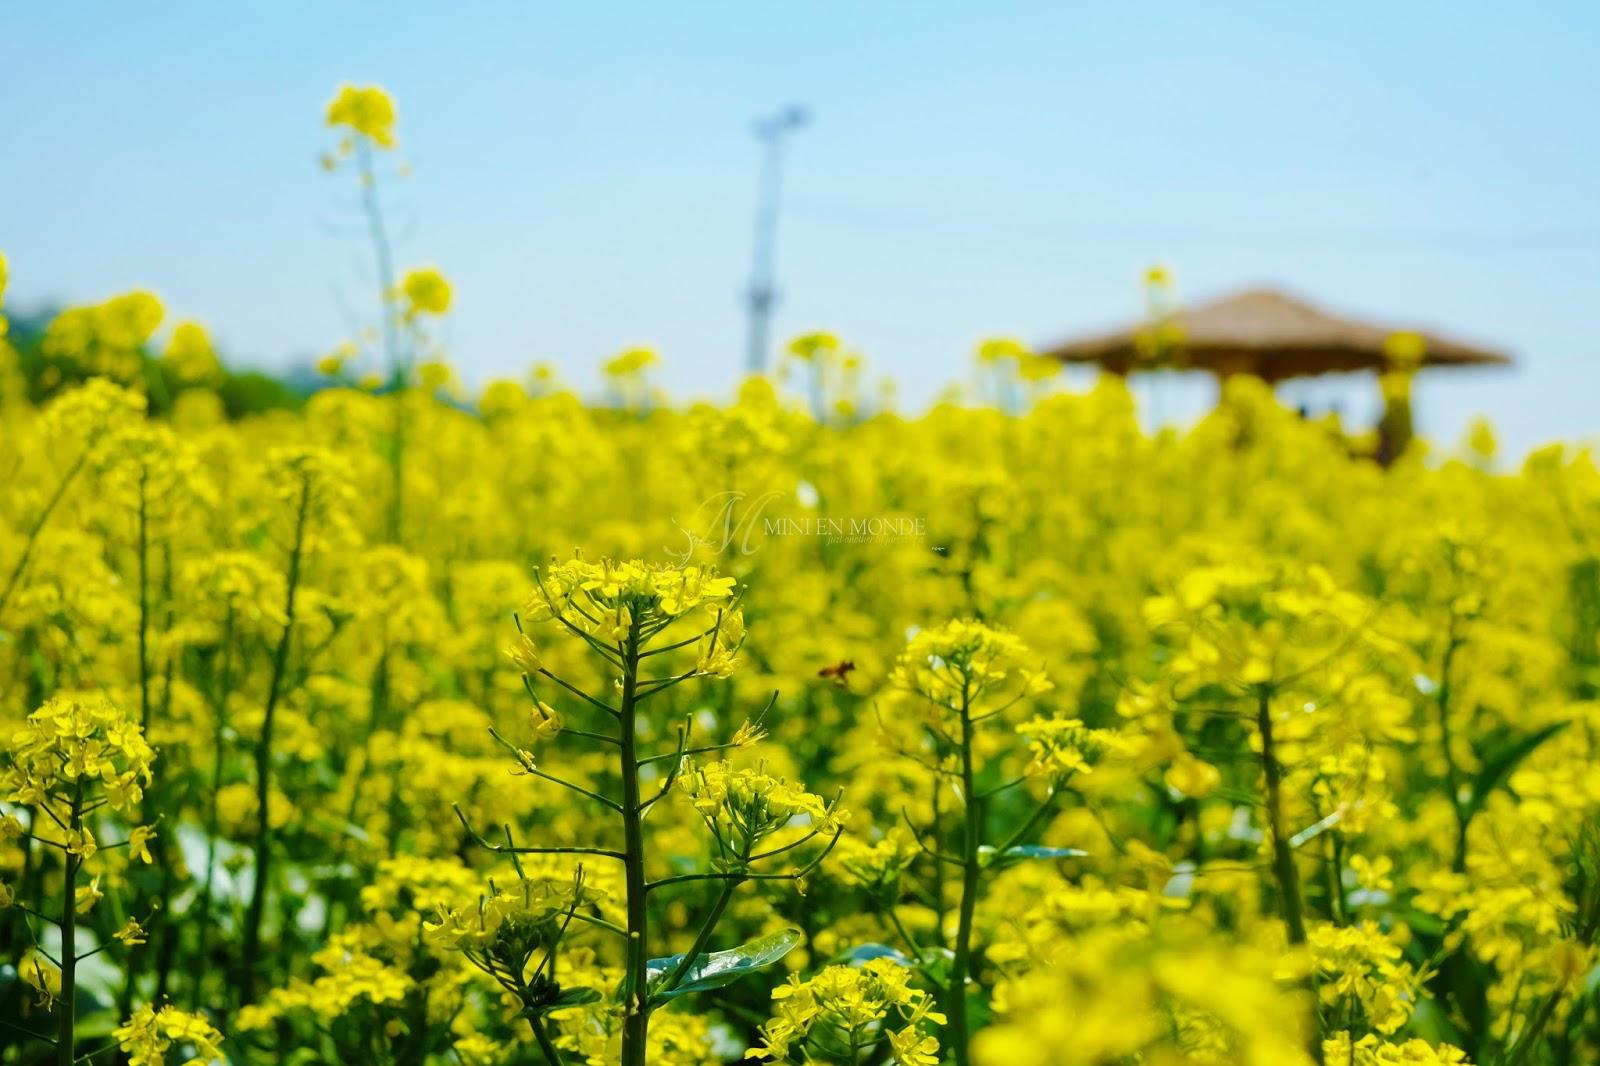 Guri Hangang Park Seoul Rapeseed Flower Festival 2015